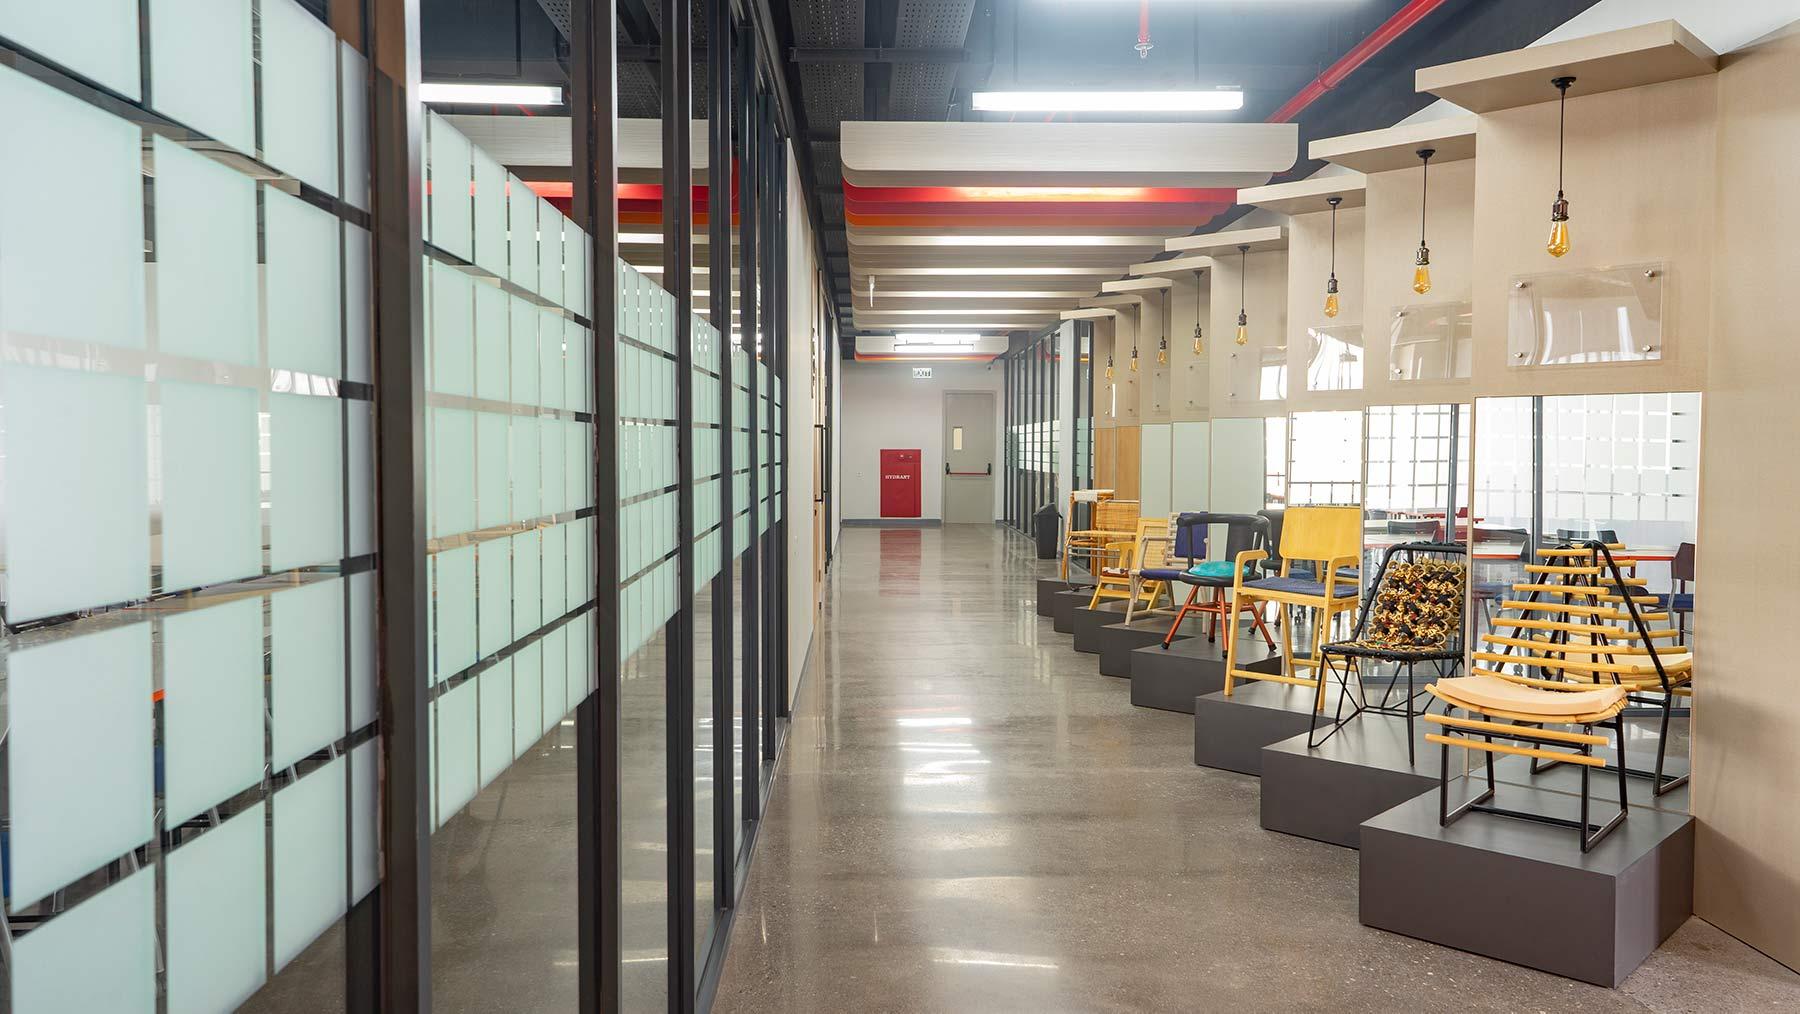 School of Creative Industry Facilities